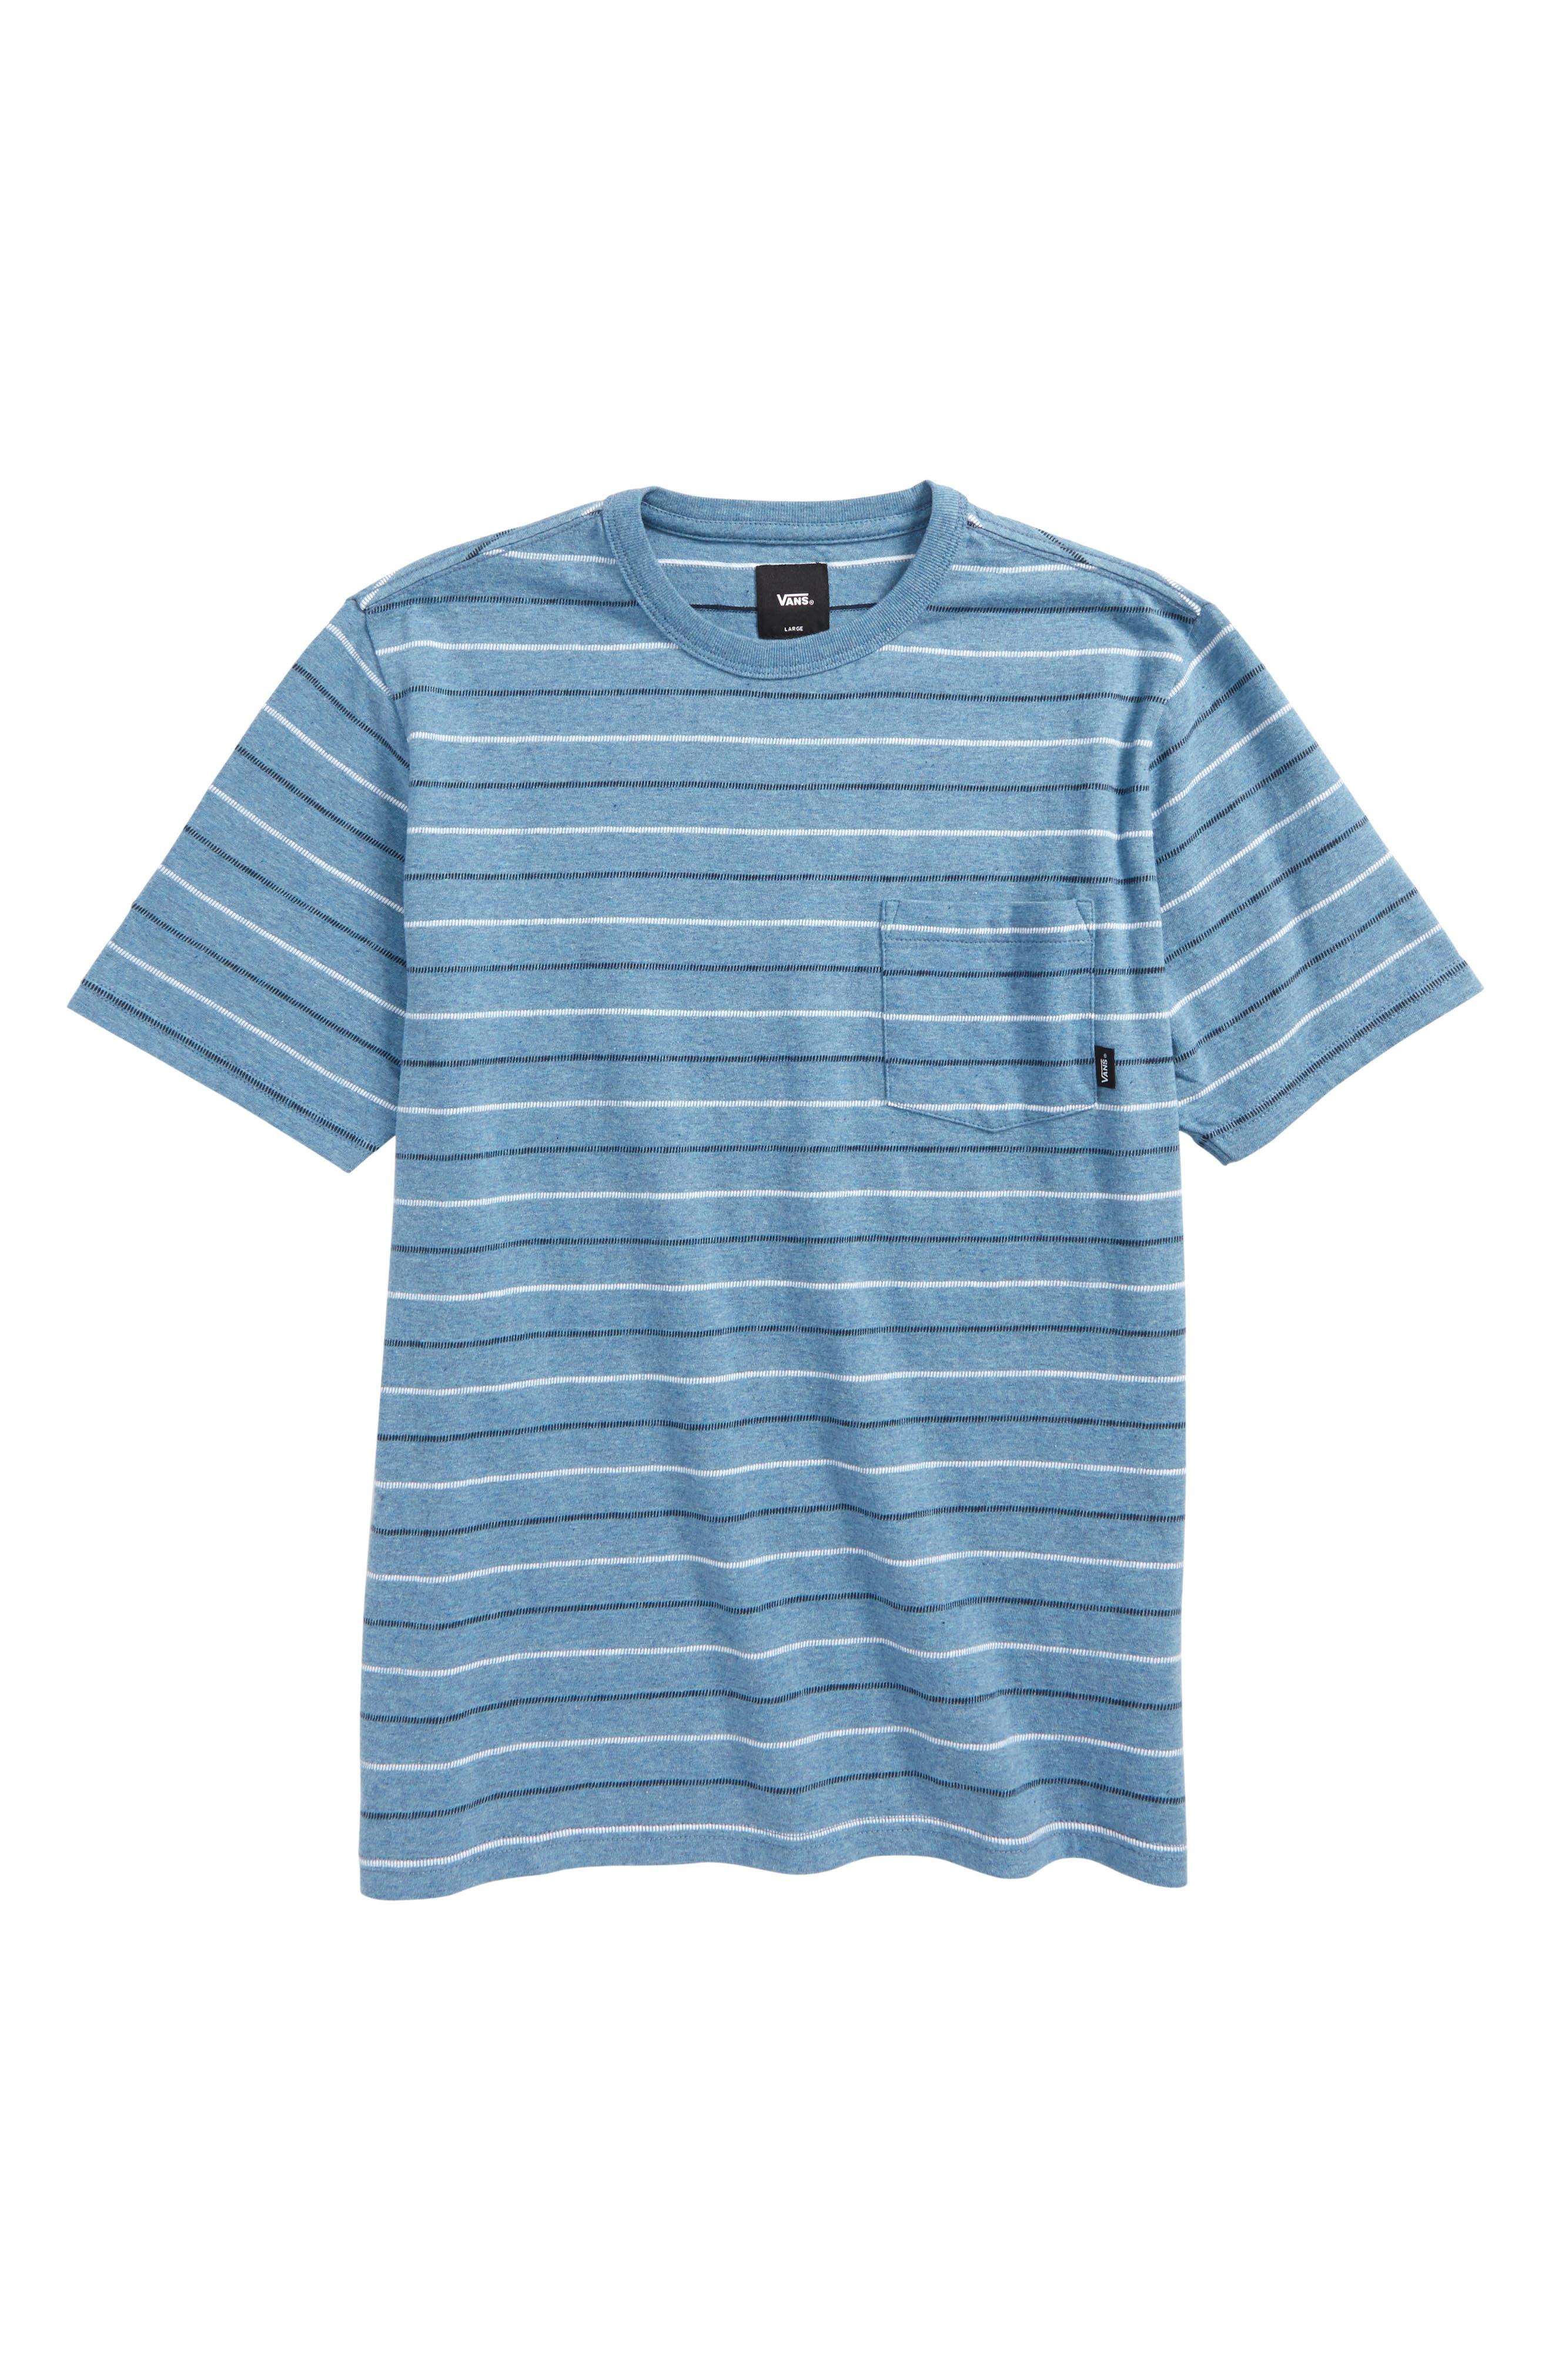 Strikemont III T-Shirt,                             Main thumbnail 1, color,                             Copen Blue Heather